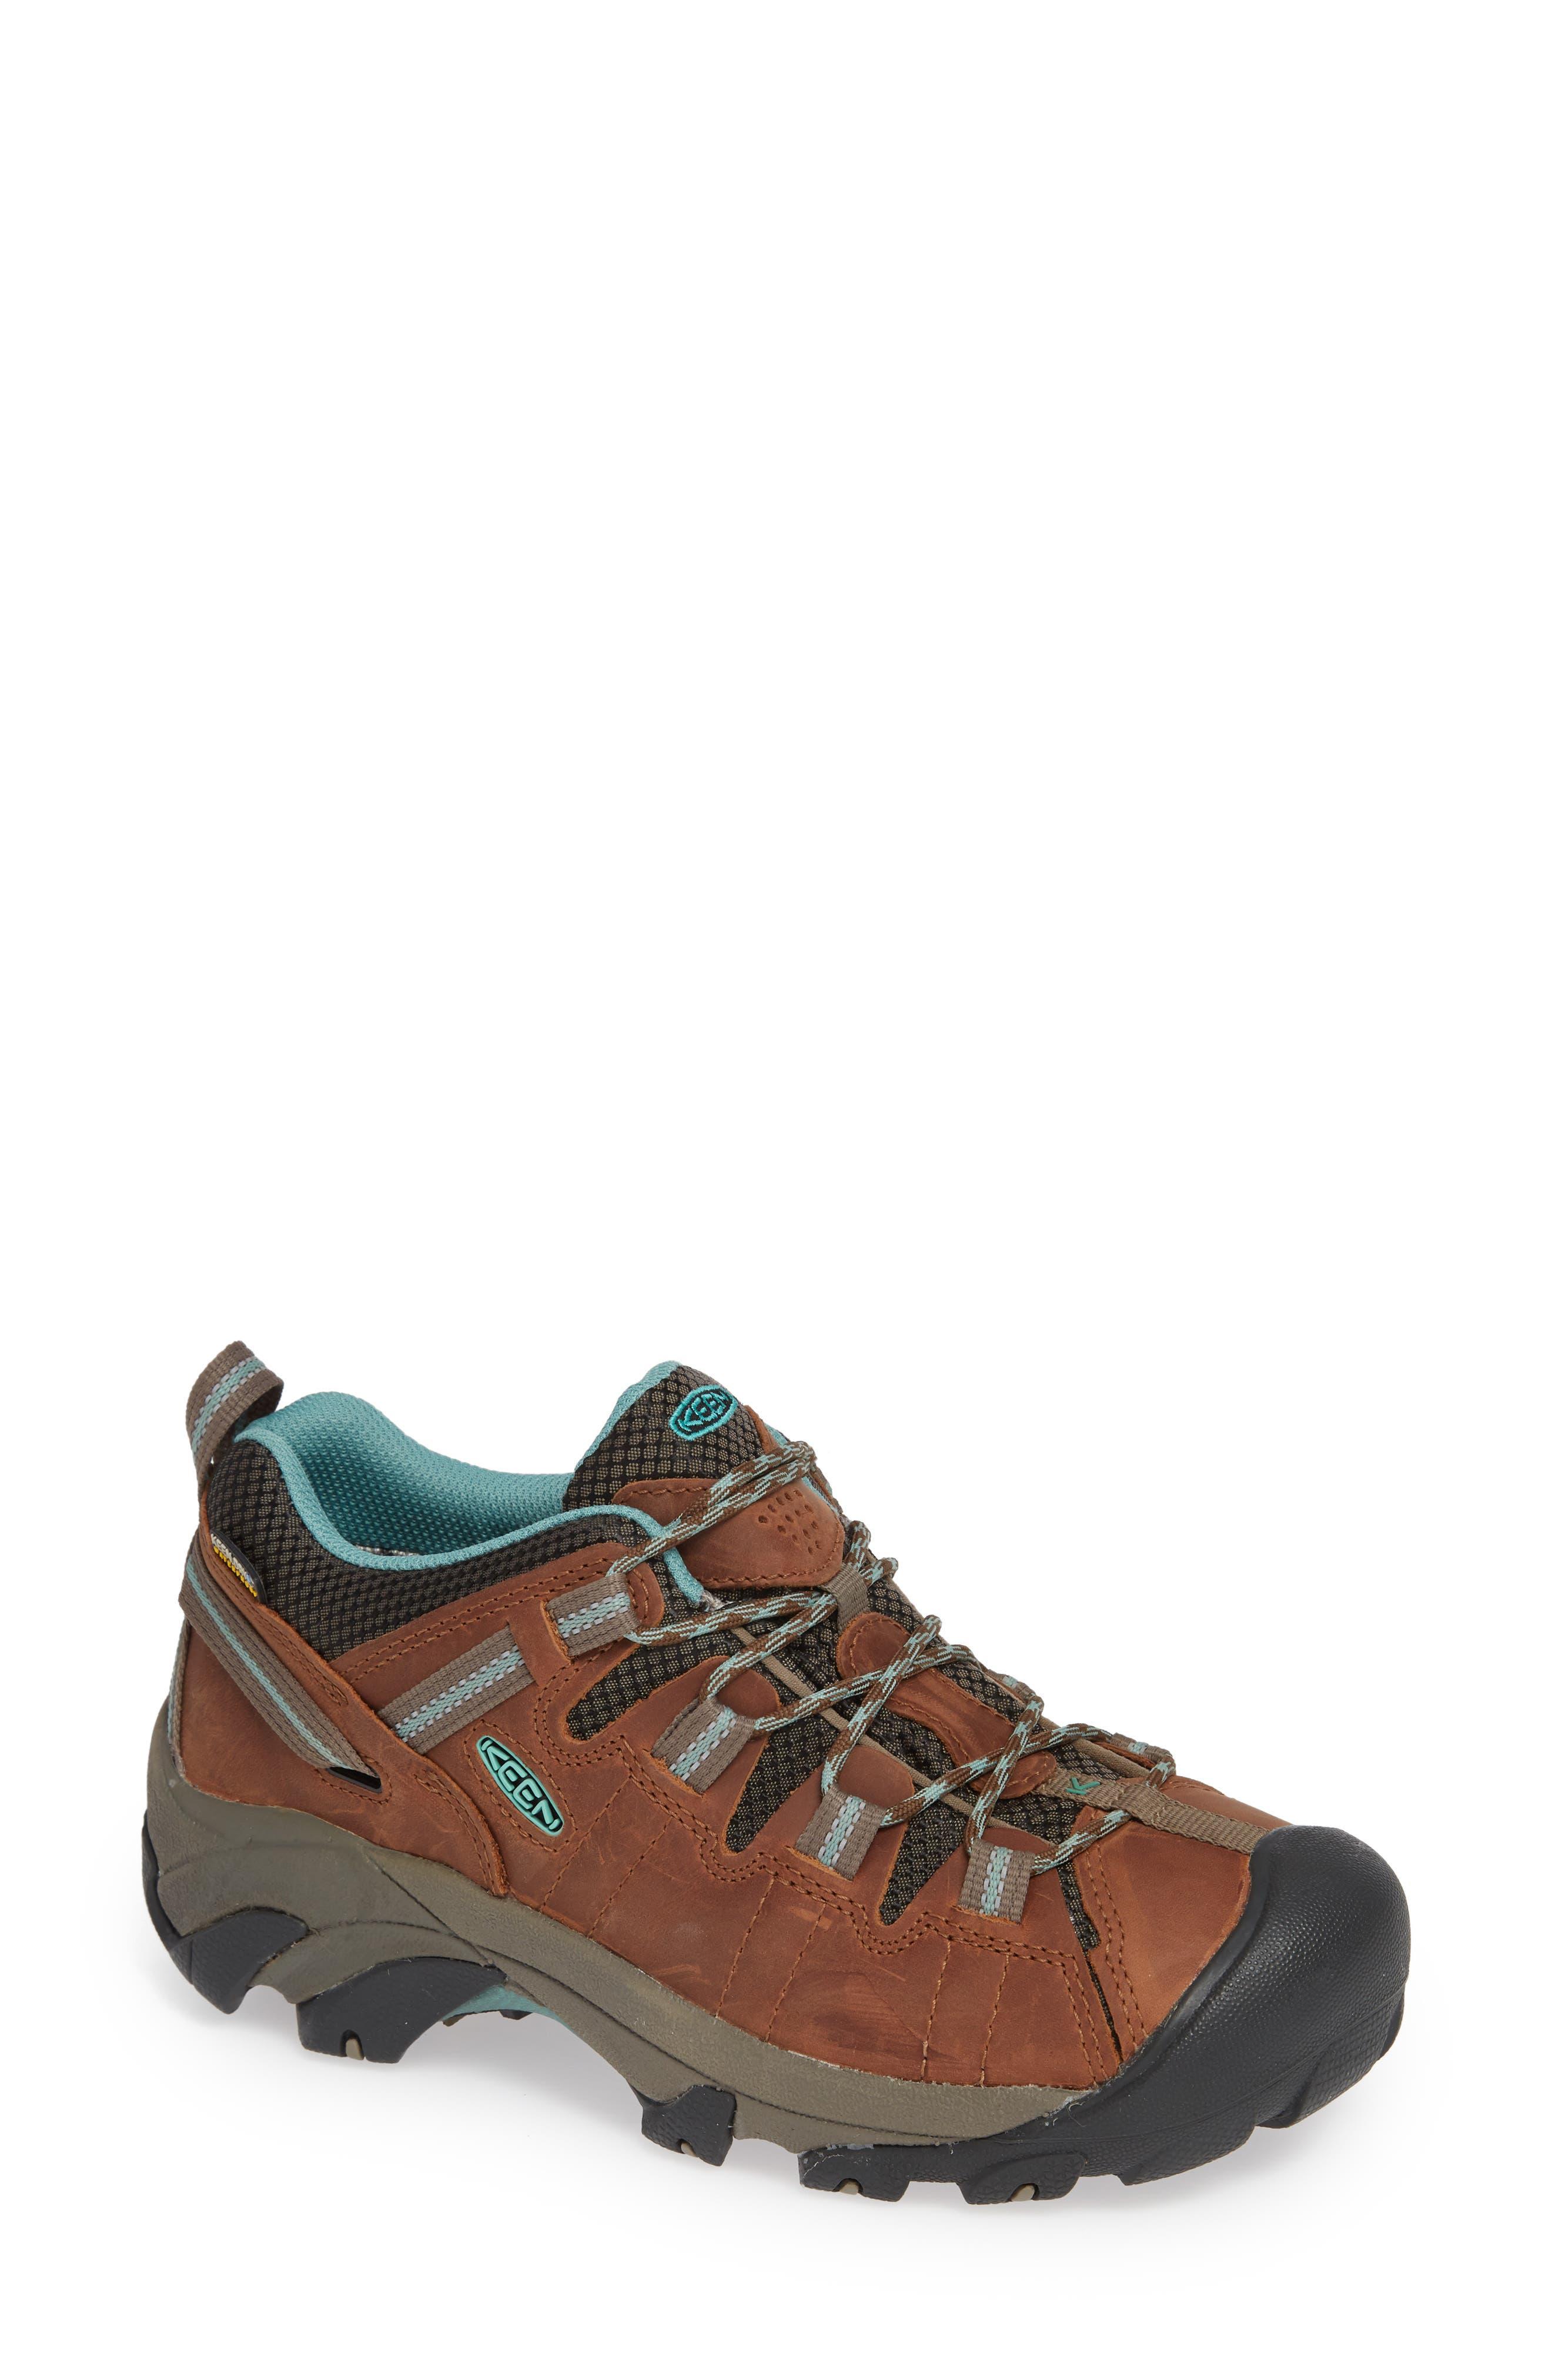 'Targhee II' Walking Shoe,                         Main,                         color, Dark Earth/ Wasabi Nubuck